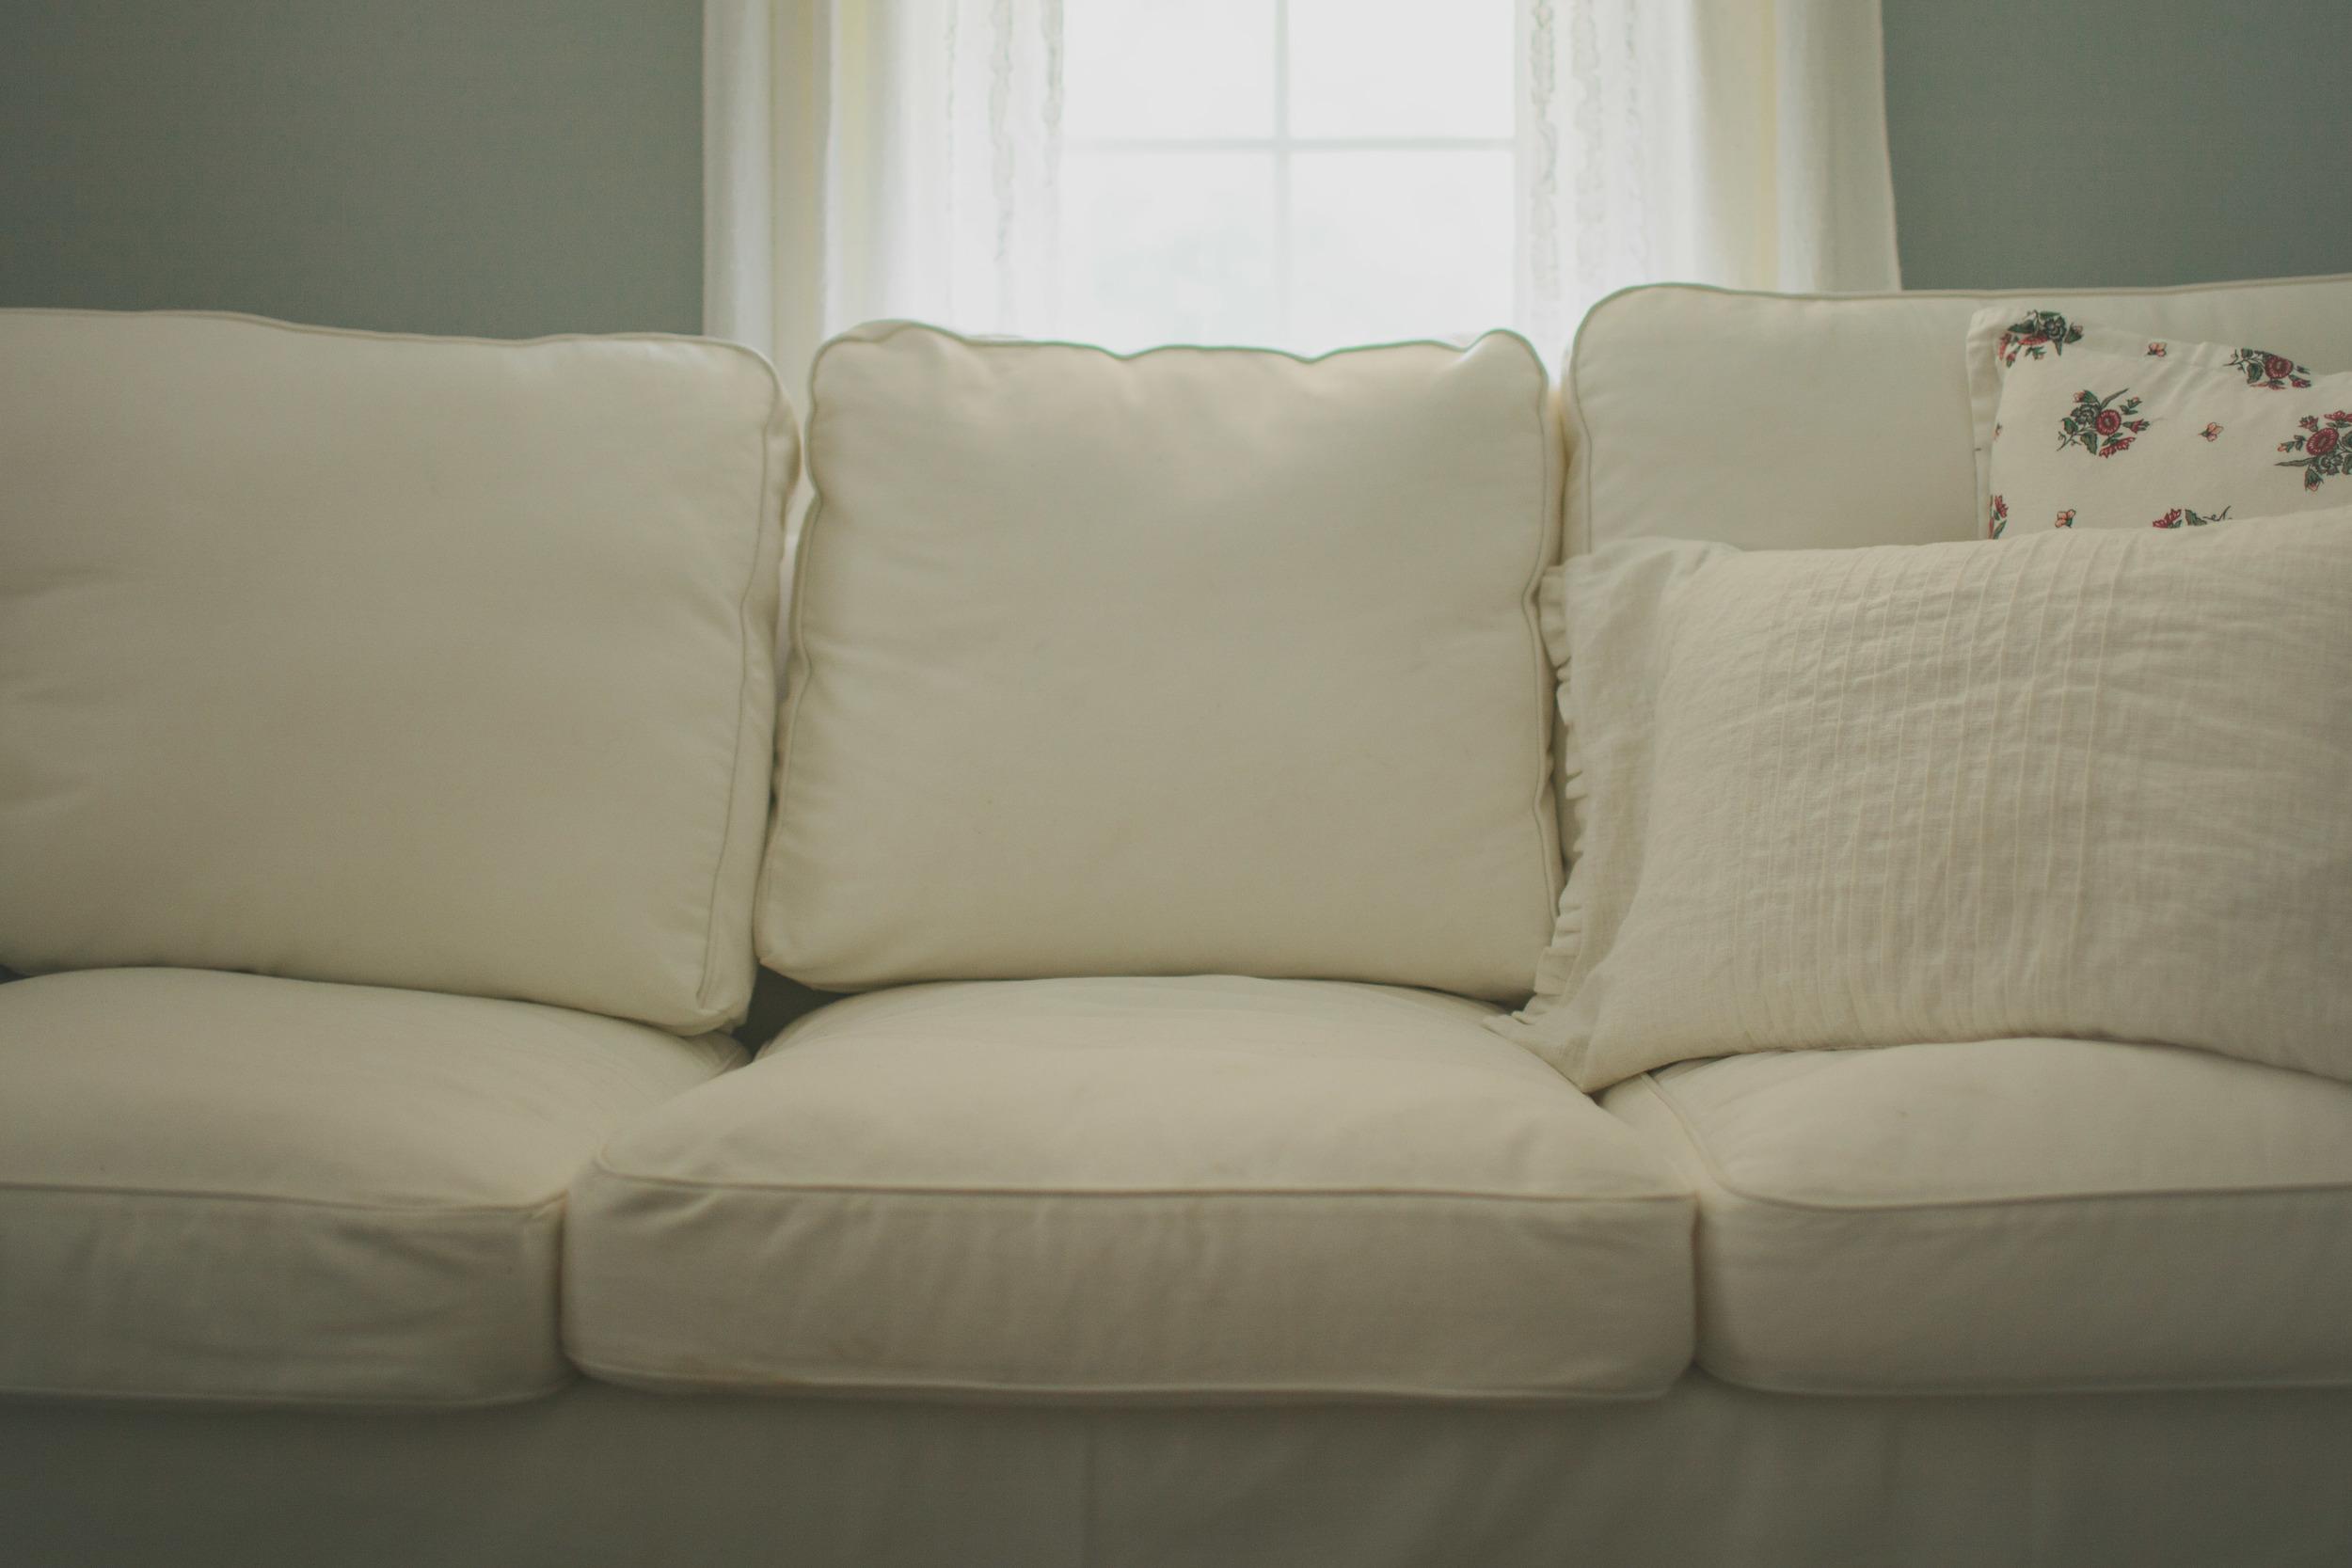 Ikea Used Furniture non-toxic tuesday | ikea flame retardant in ektorp sofa — tierney